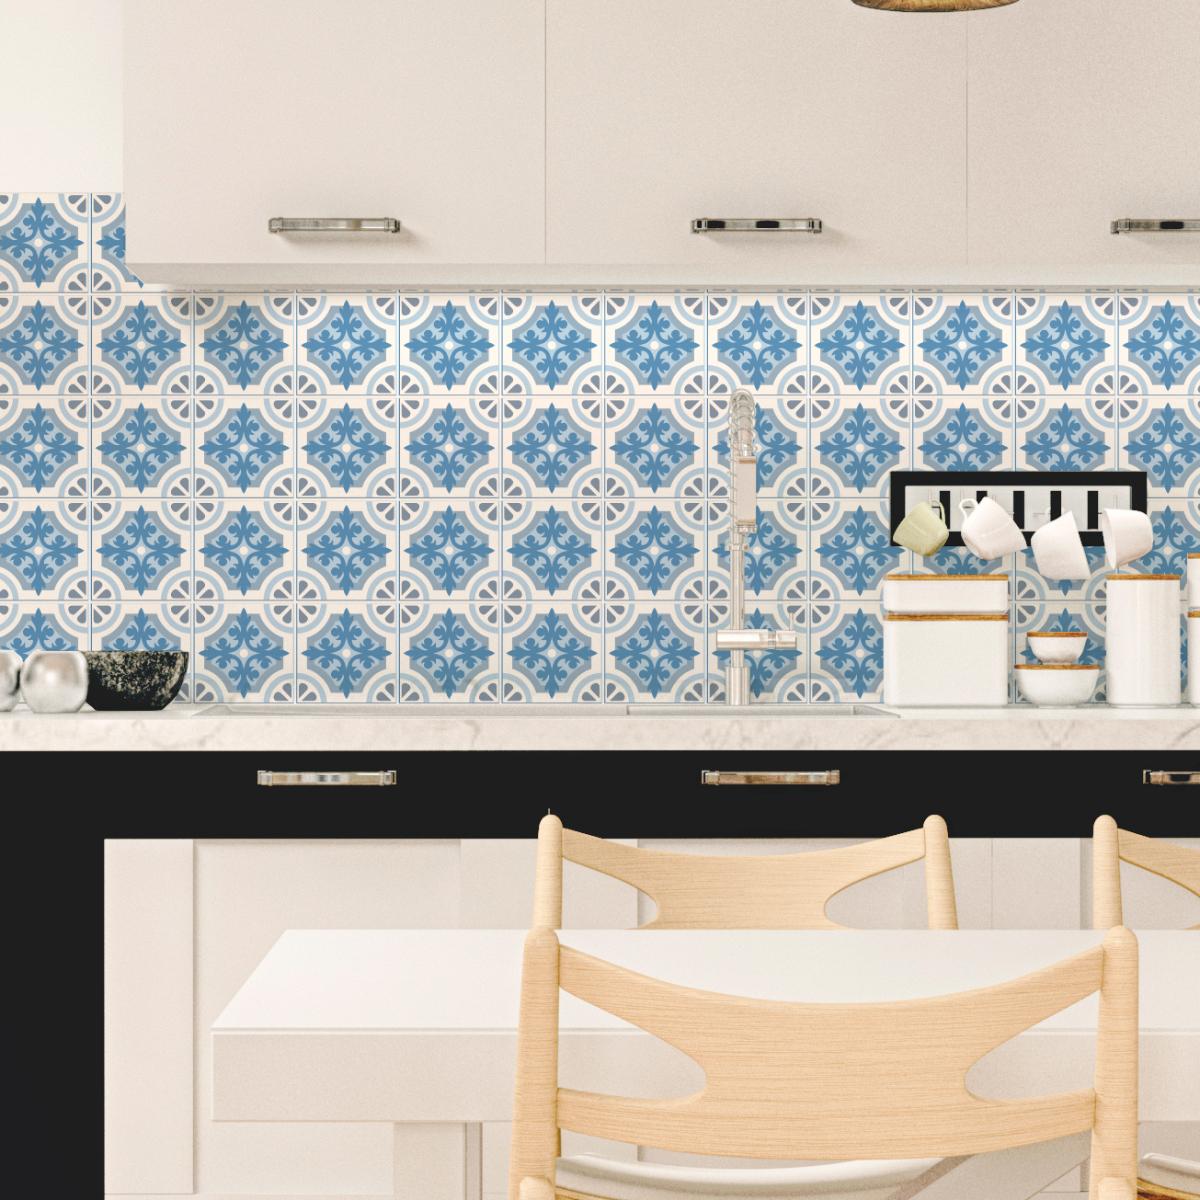 30 stickers carrelages azulejos tosca salle de bain mur. Black Bedroom Furniture Sets. Home Design Ideas